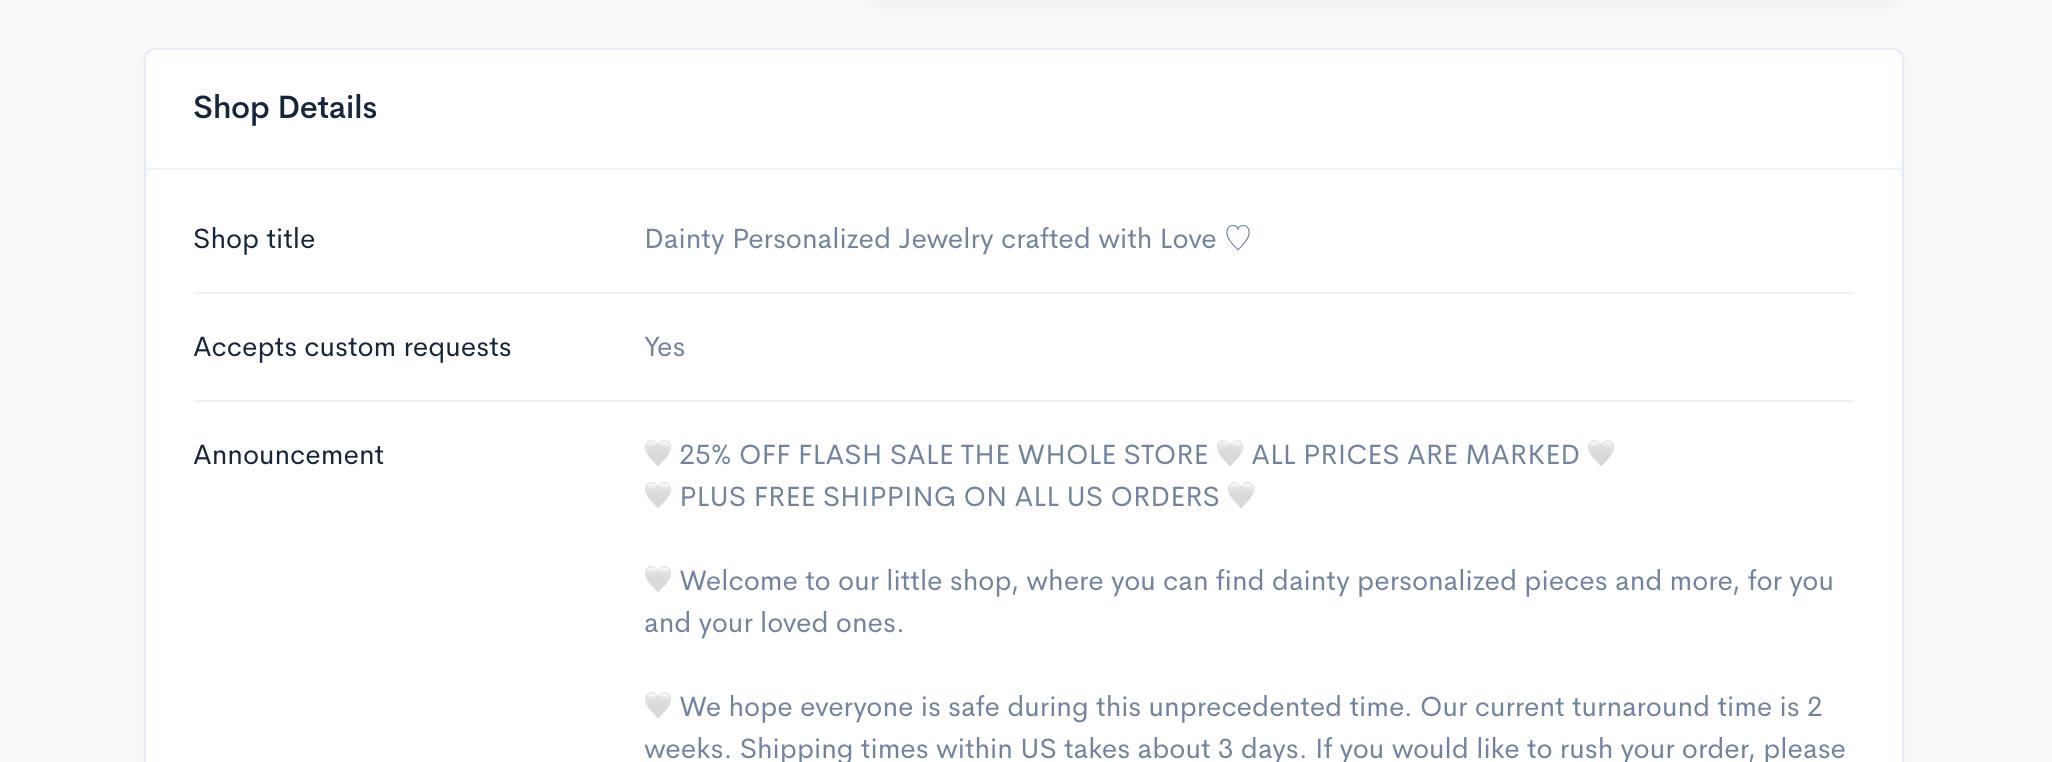 Alura - Shop details